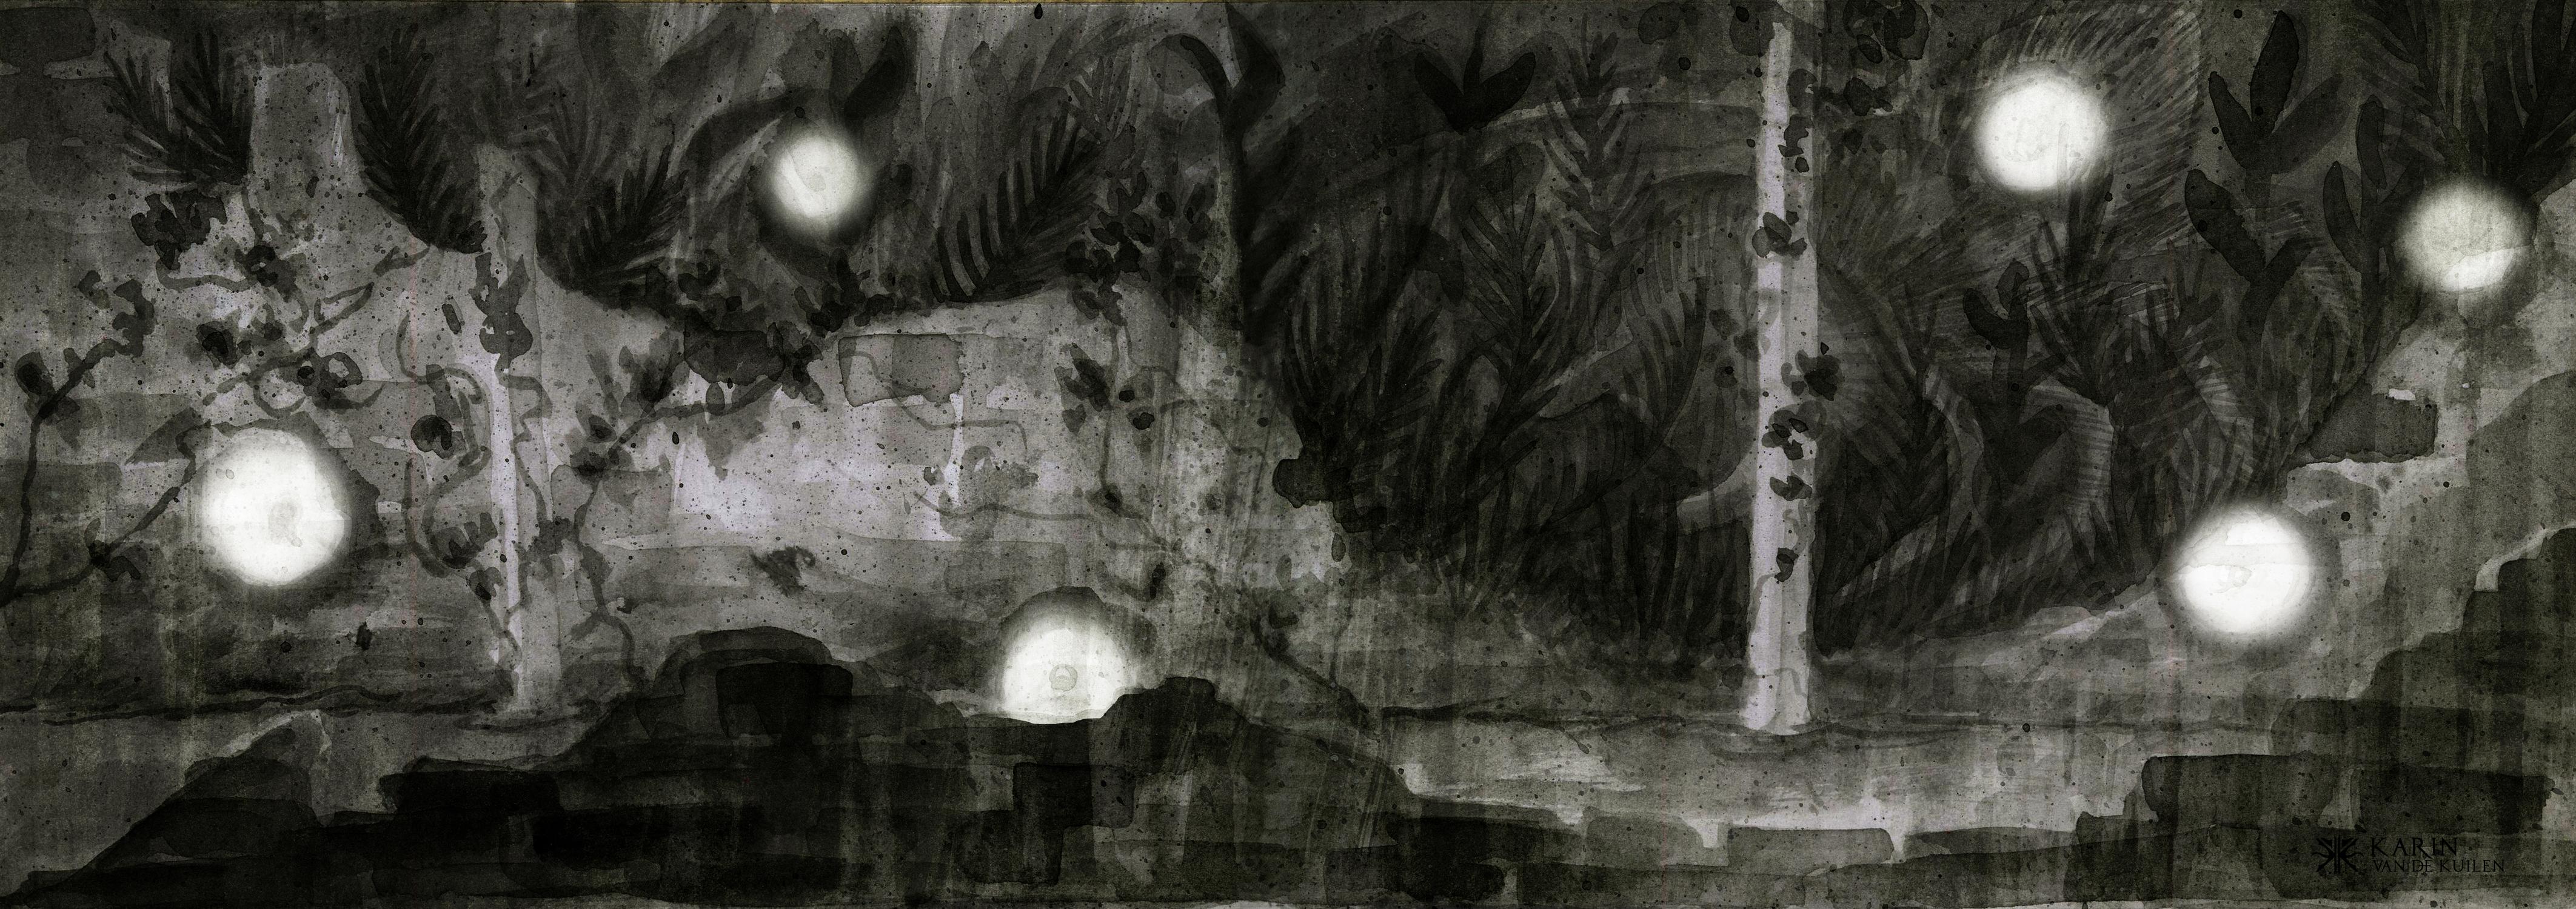 Shadows house 1 Artwork by Karin  van de Kuilen